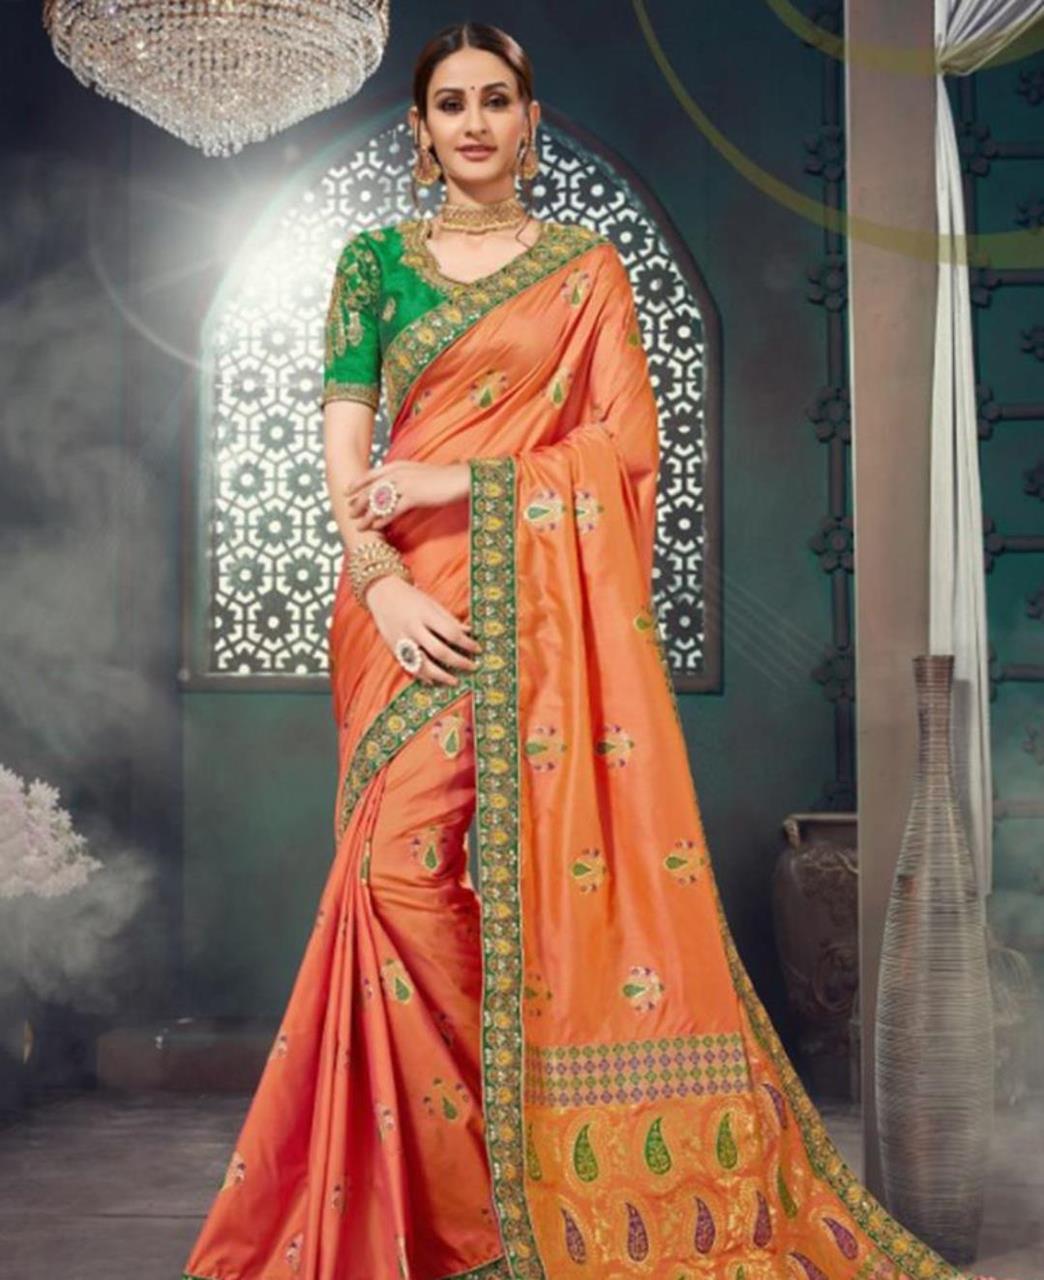 Embroidered Cotton Saree in Orange